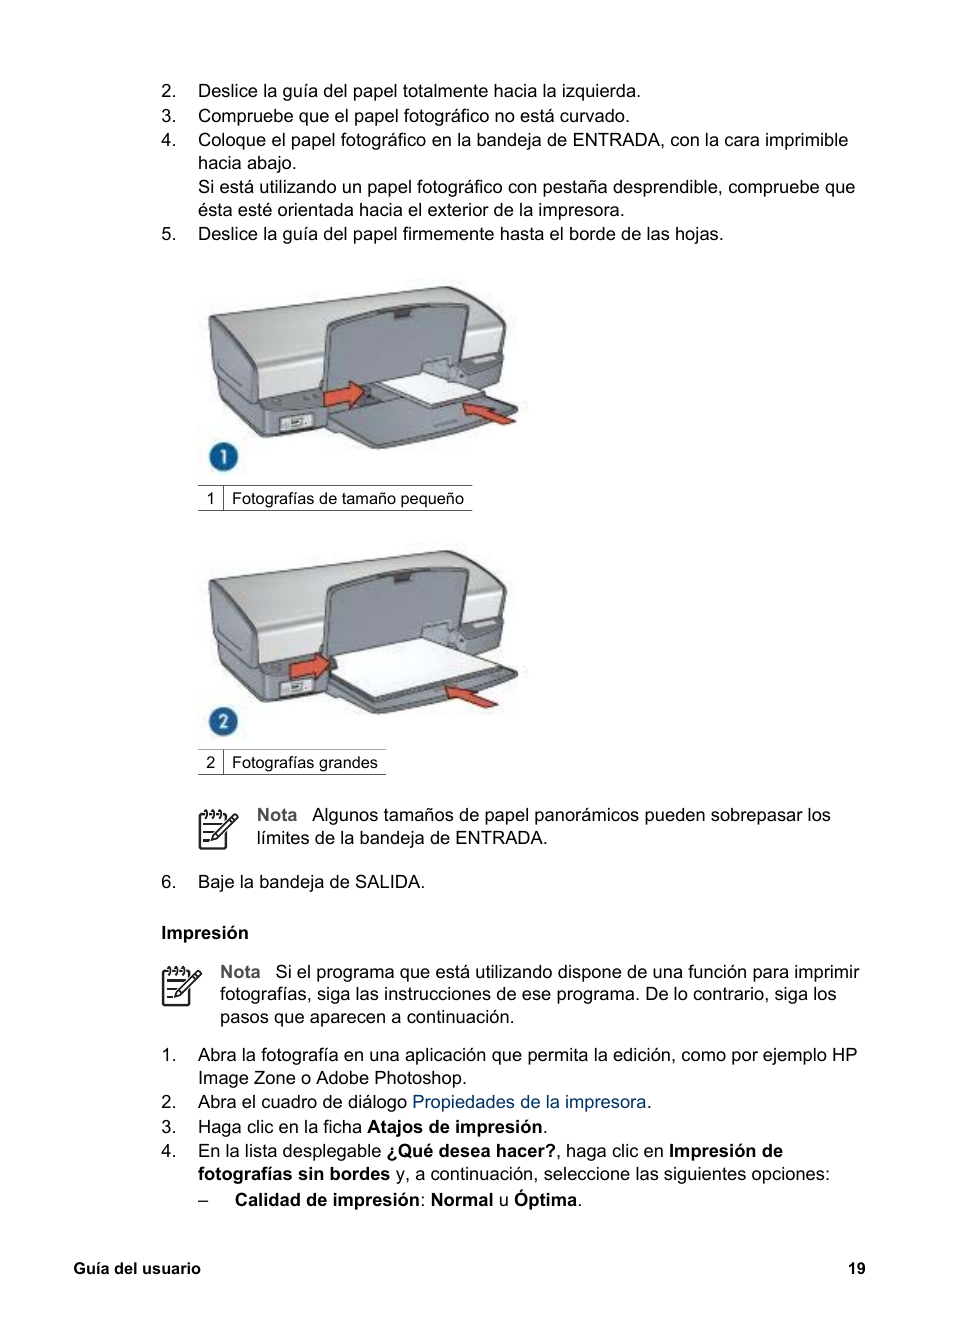 hp impresora color de inyecci n de tinta hp deskjet 5440 manual del rh pdfmanuales com HP Deskjet 1280 hp deskjet 5440 service manual